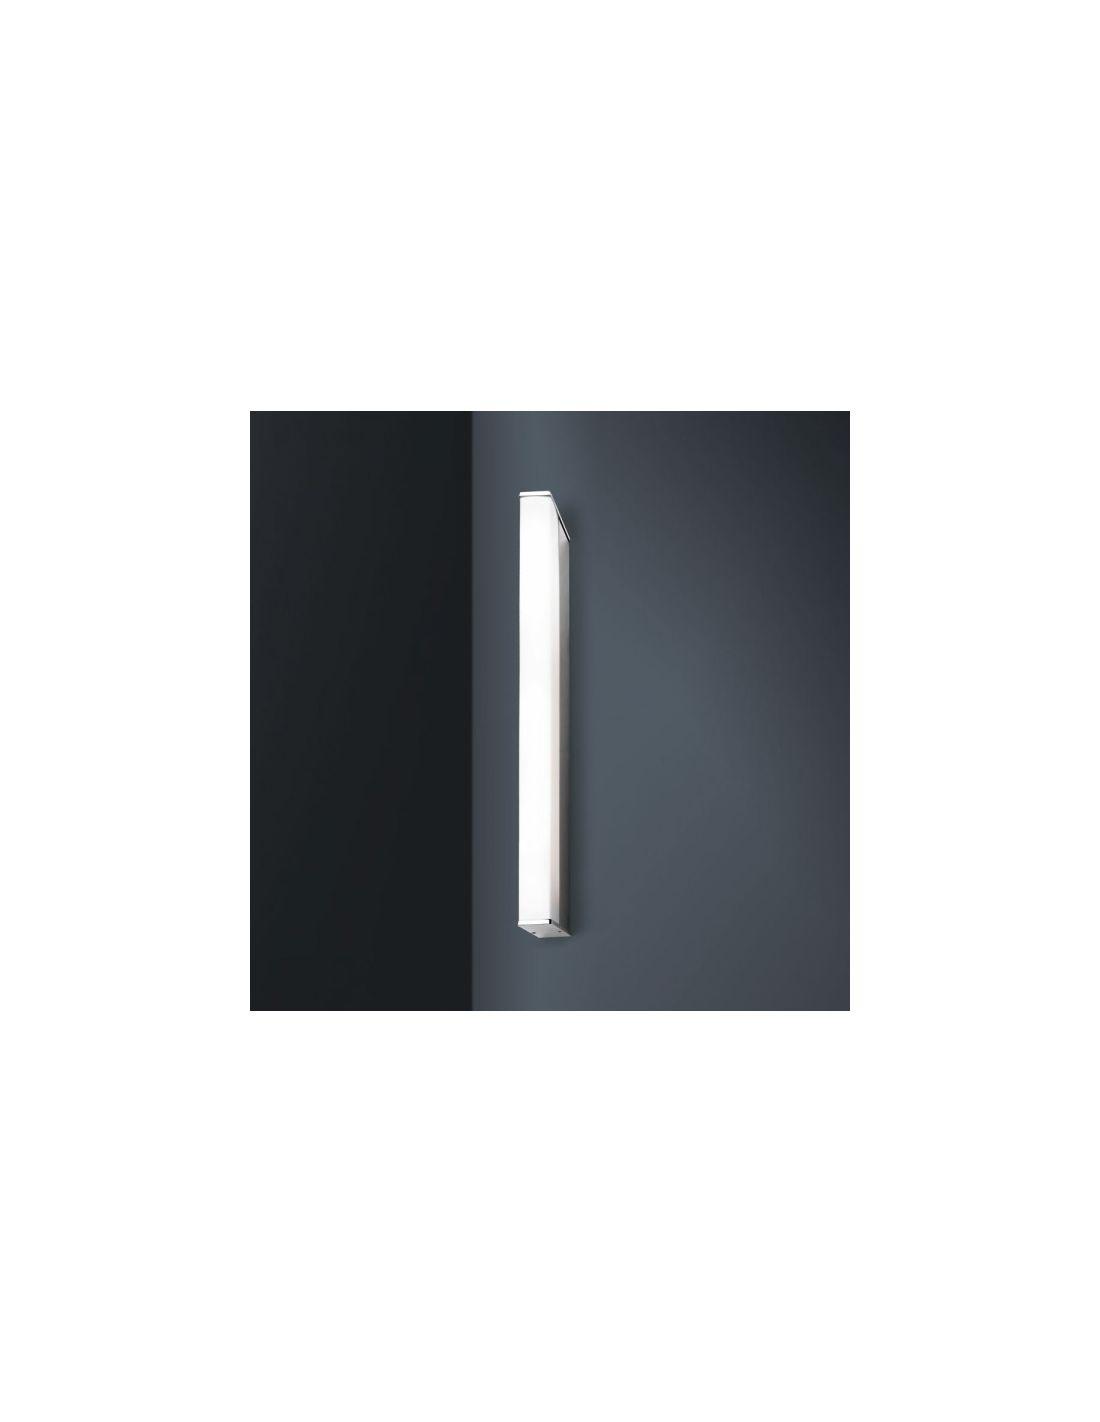 Lamparas Para Baño Baratas:Luces de Pared para los laterales de Leds C4, La Creu